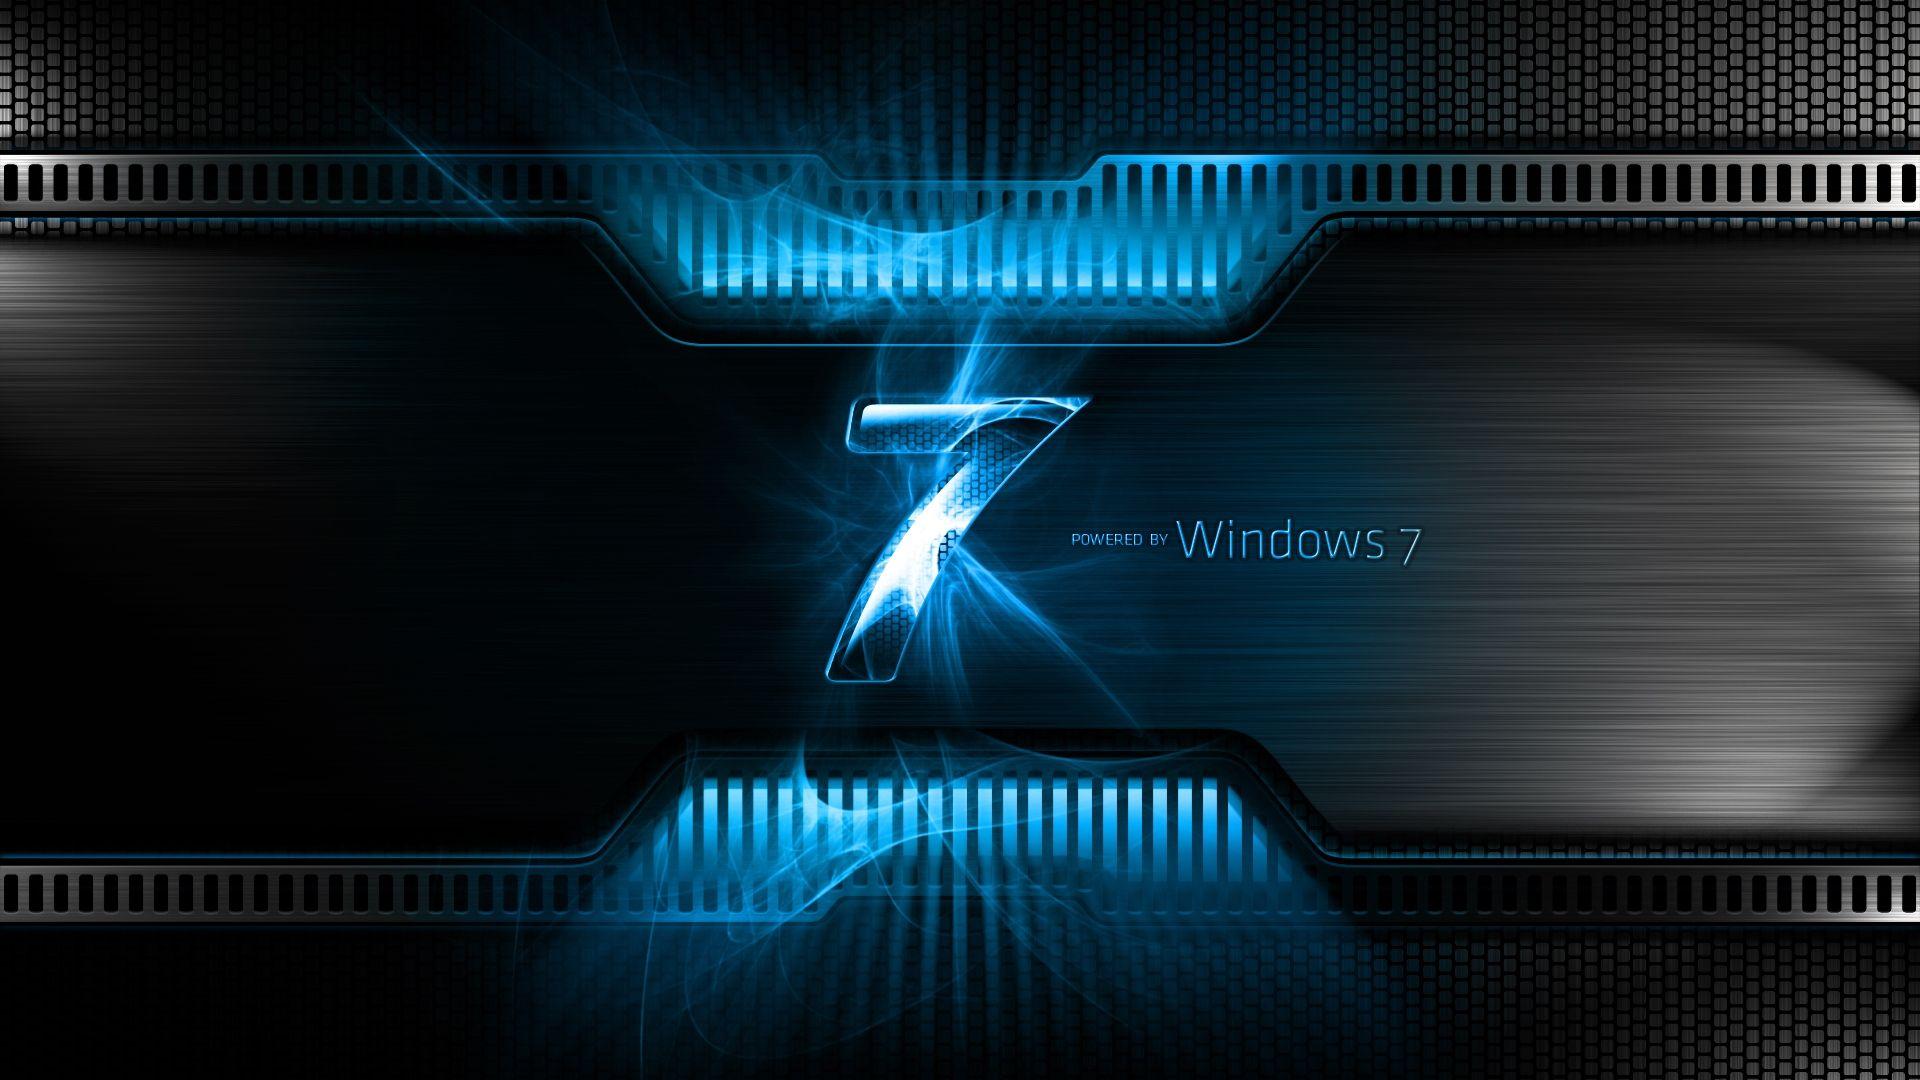 Full Screen 1080p Windows 7 Wallpaper Hd Images Slike